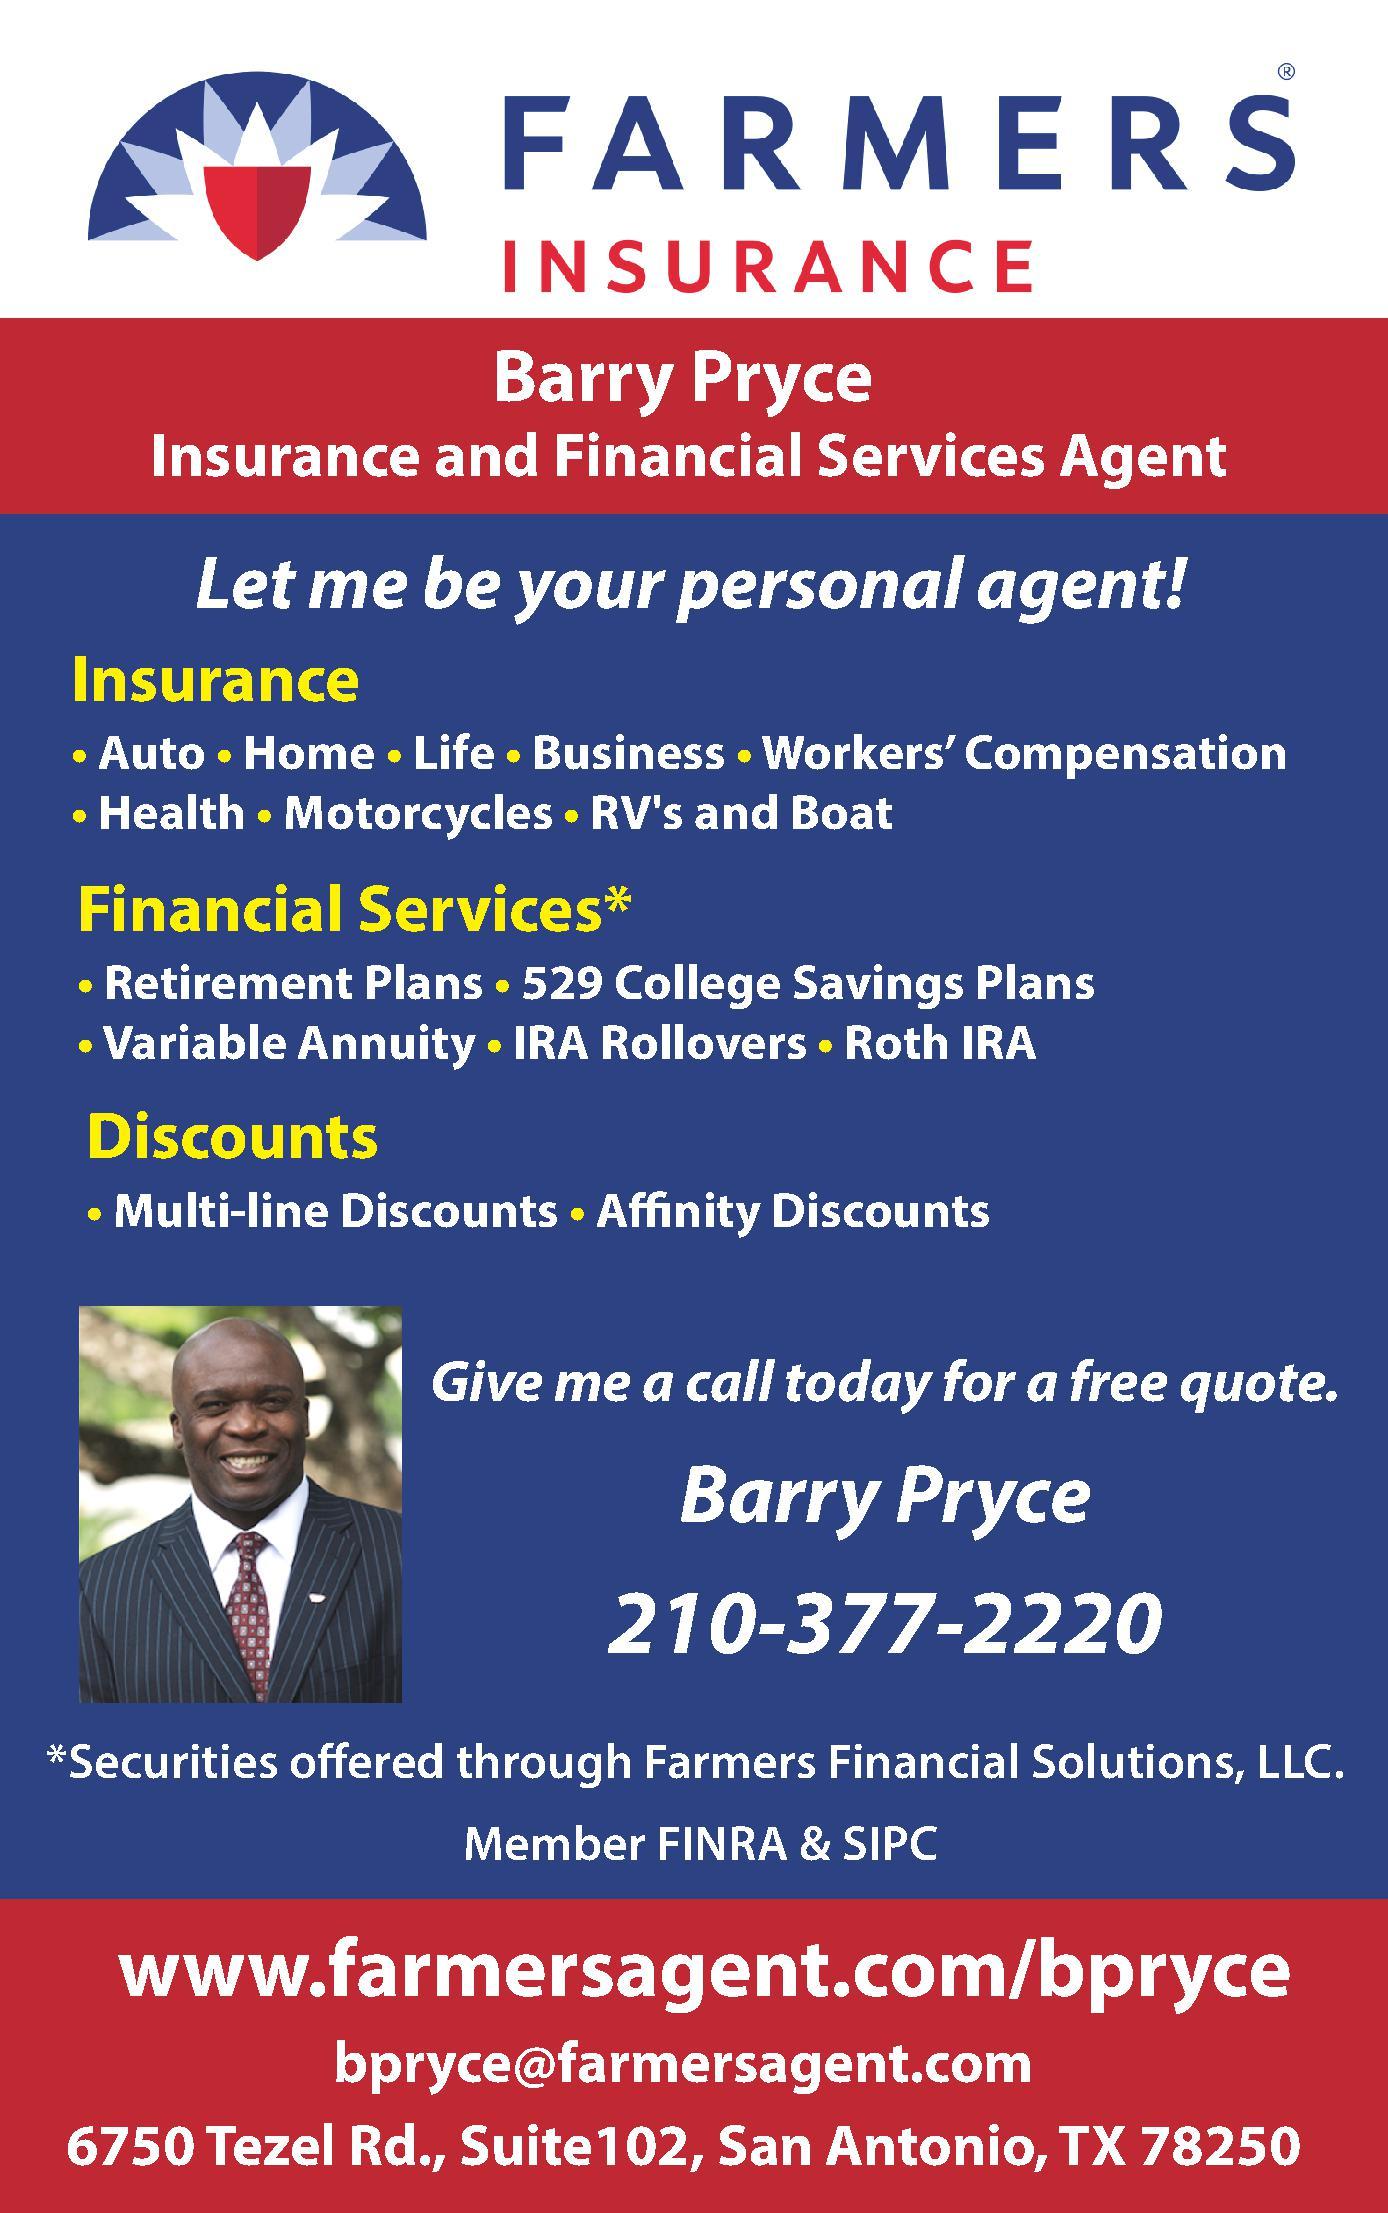 Farmers Insurance - Pryce